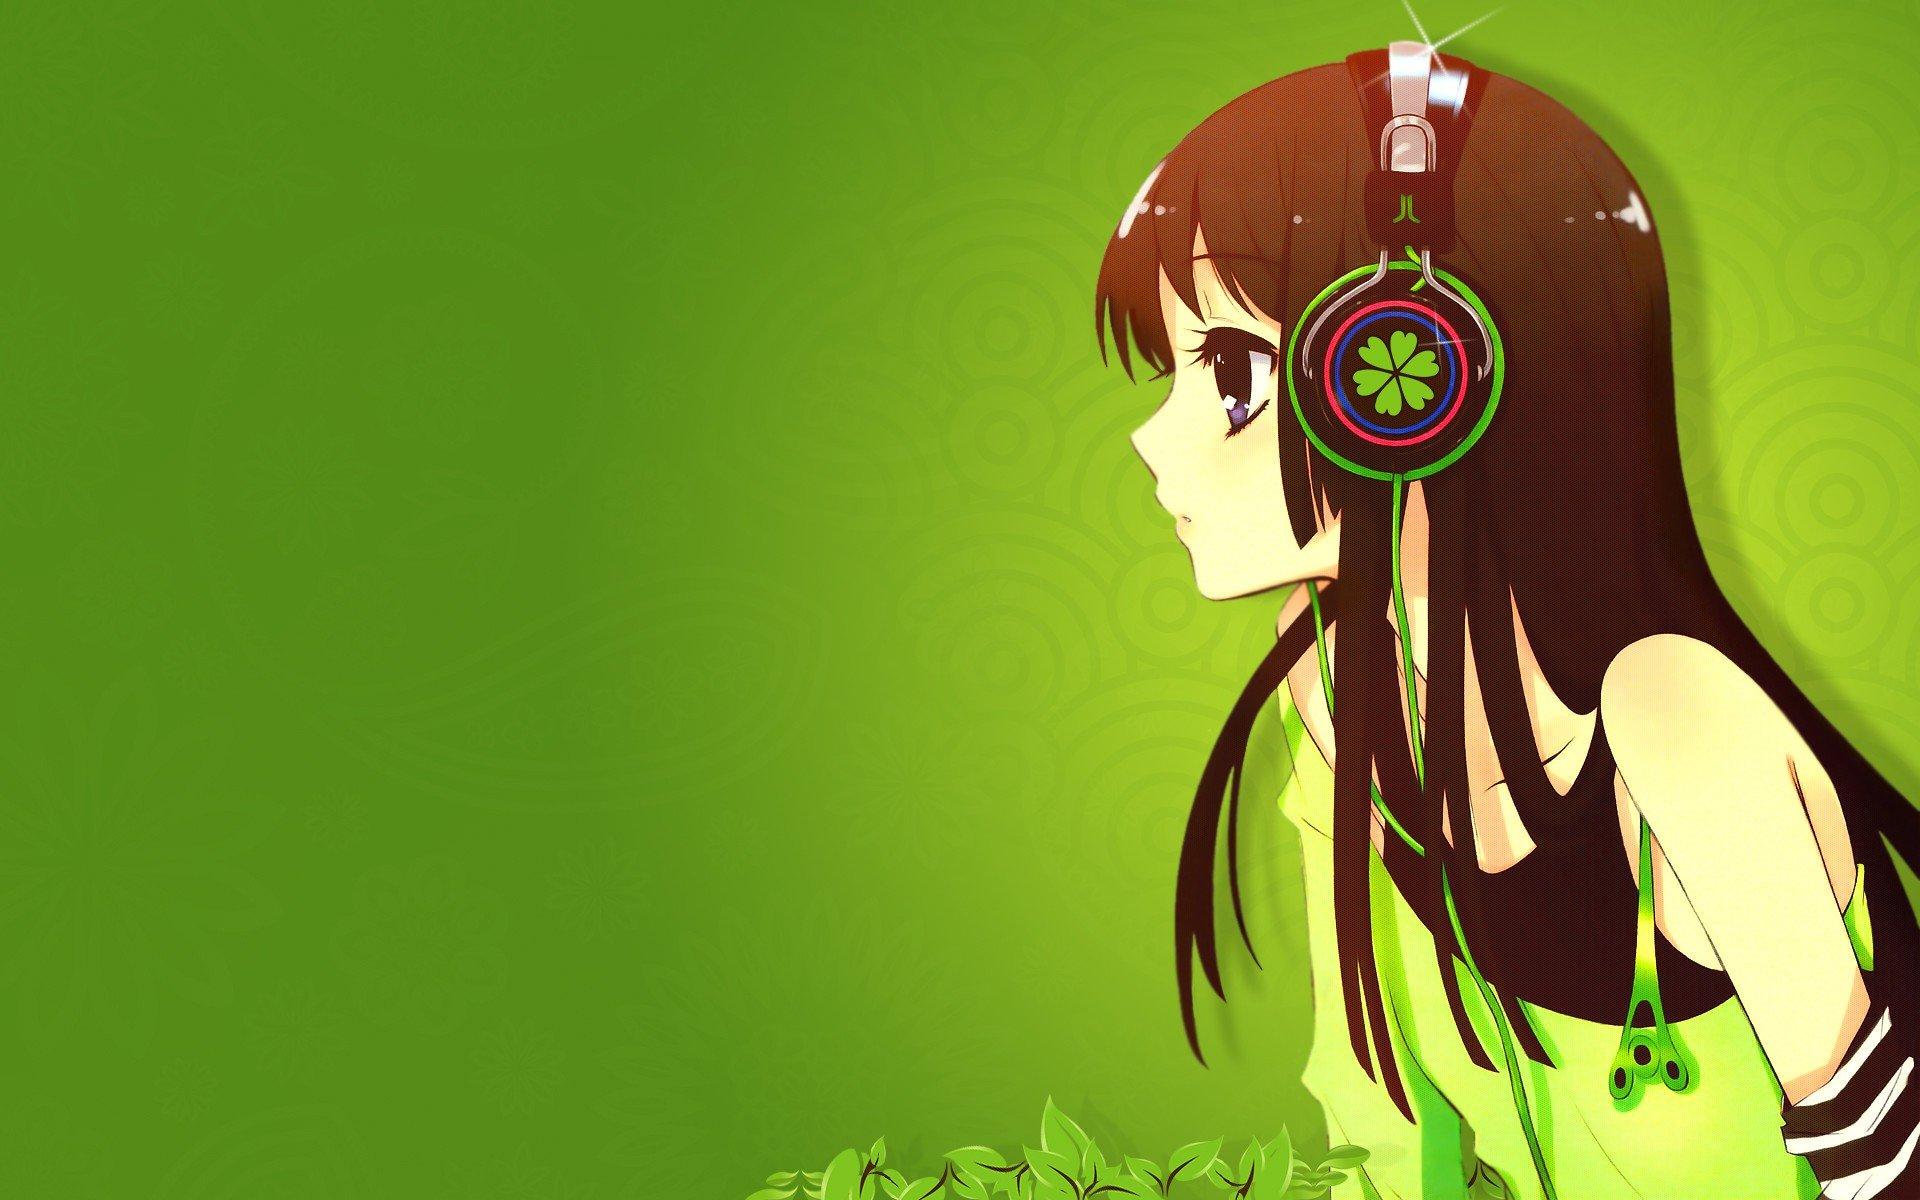 Headphones Green K On Akiyama Mio Anime Simple Background Anime Girls Wallpaper 1920x1200 335031 Wallpaperup